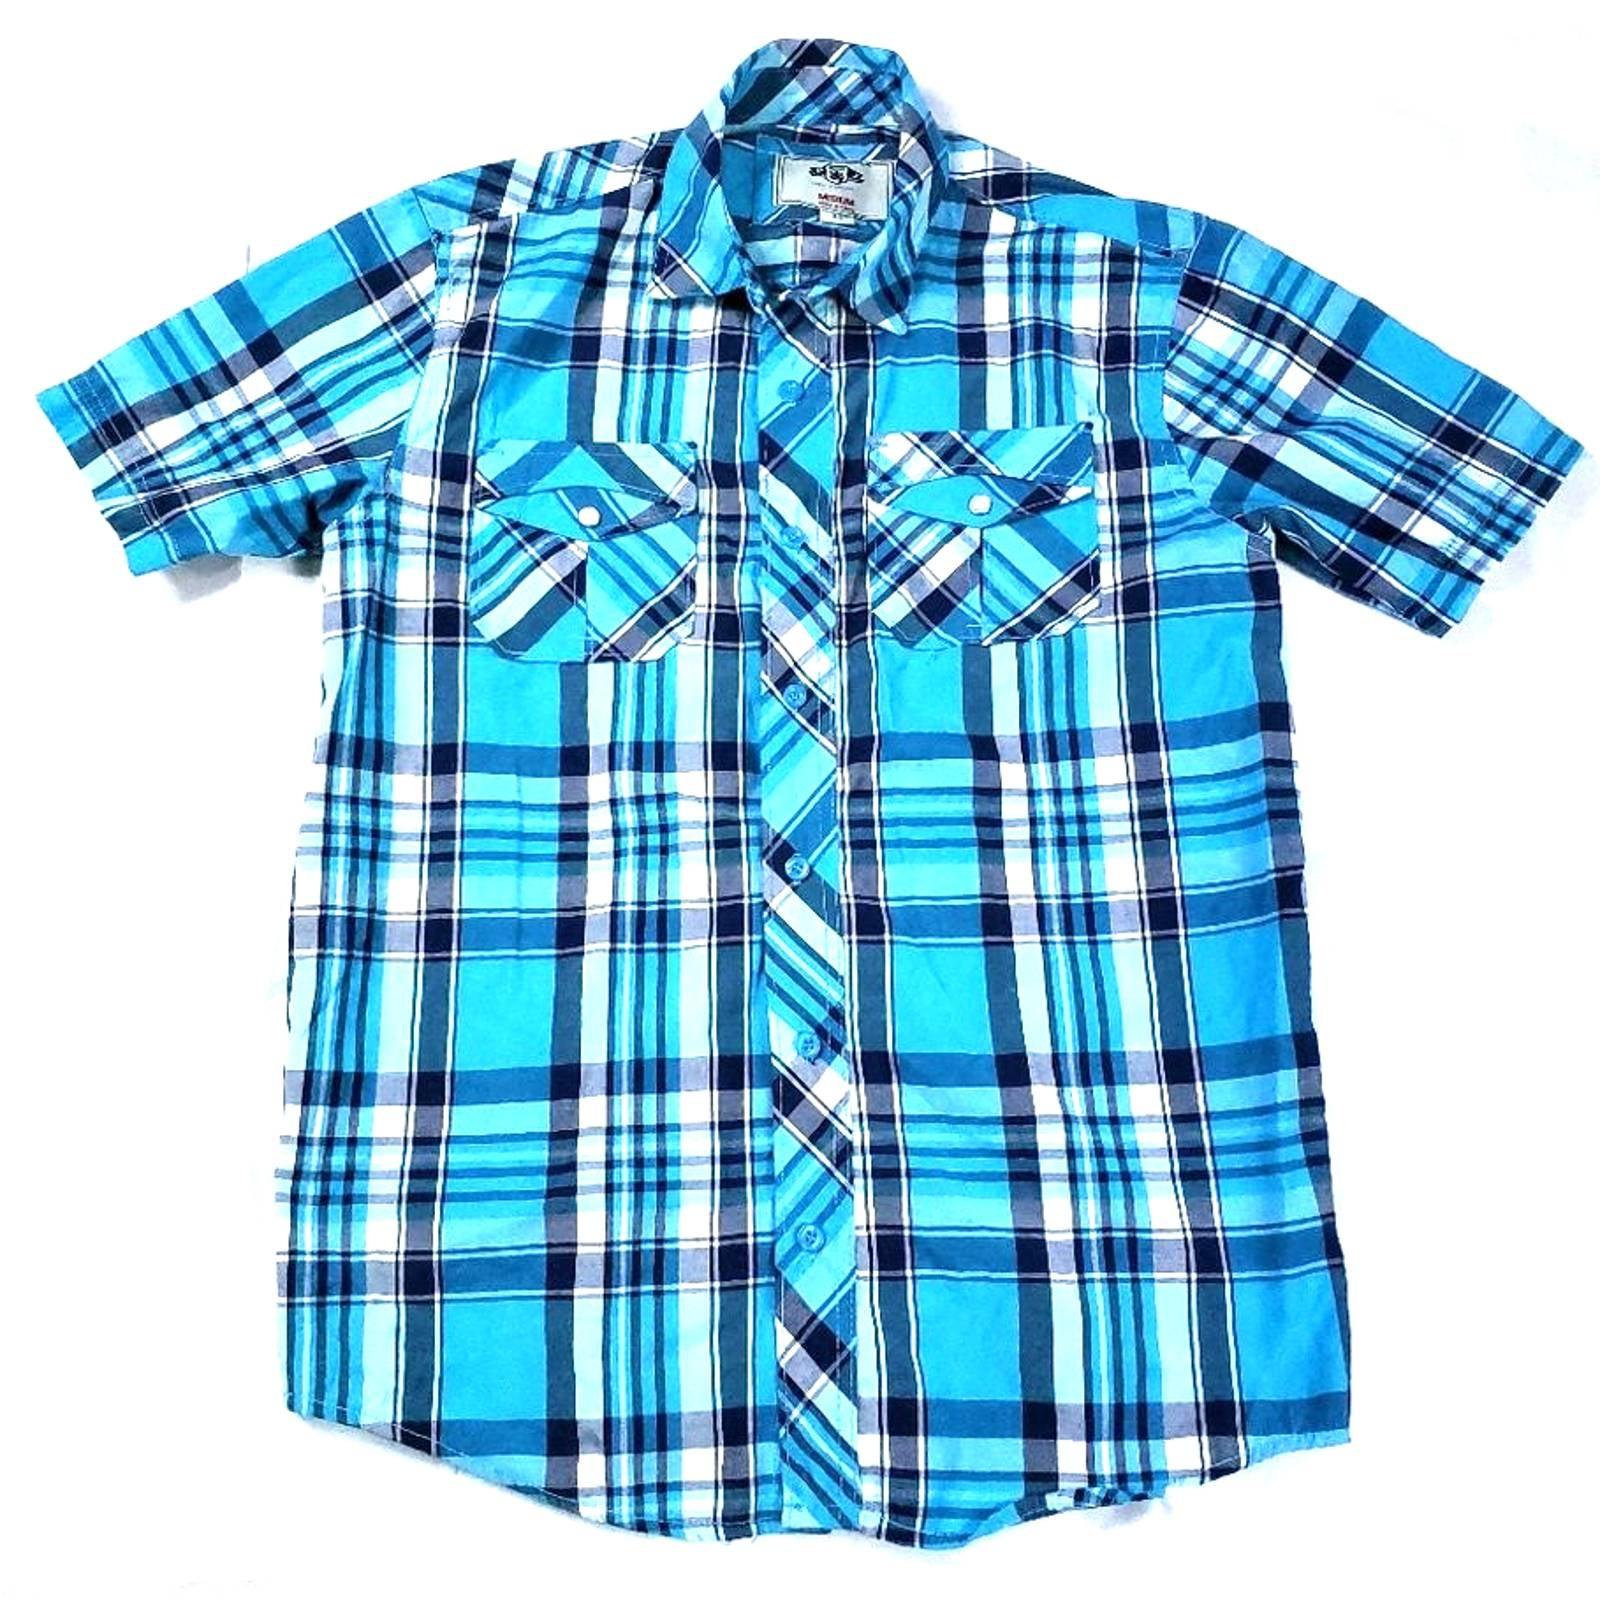 PJ Mark Blue Check Button up Front Shirt